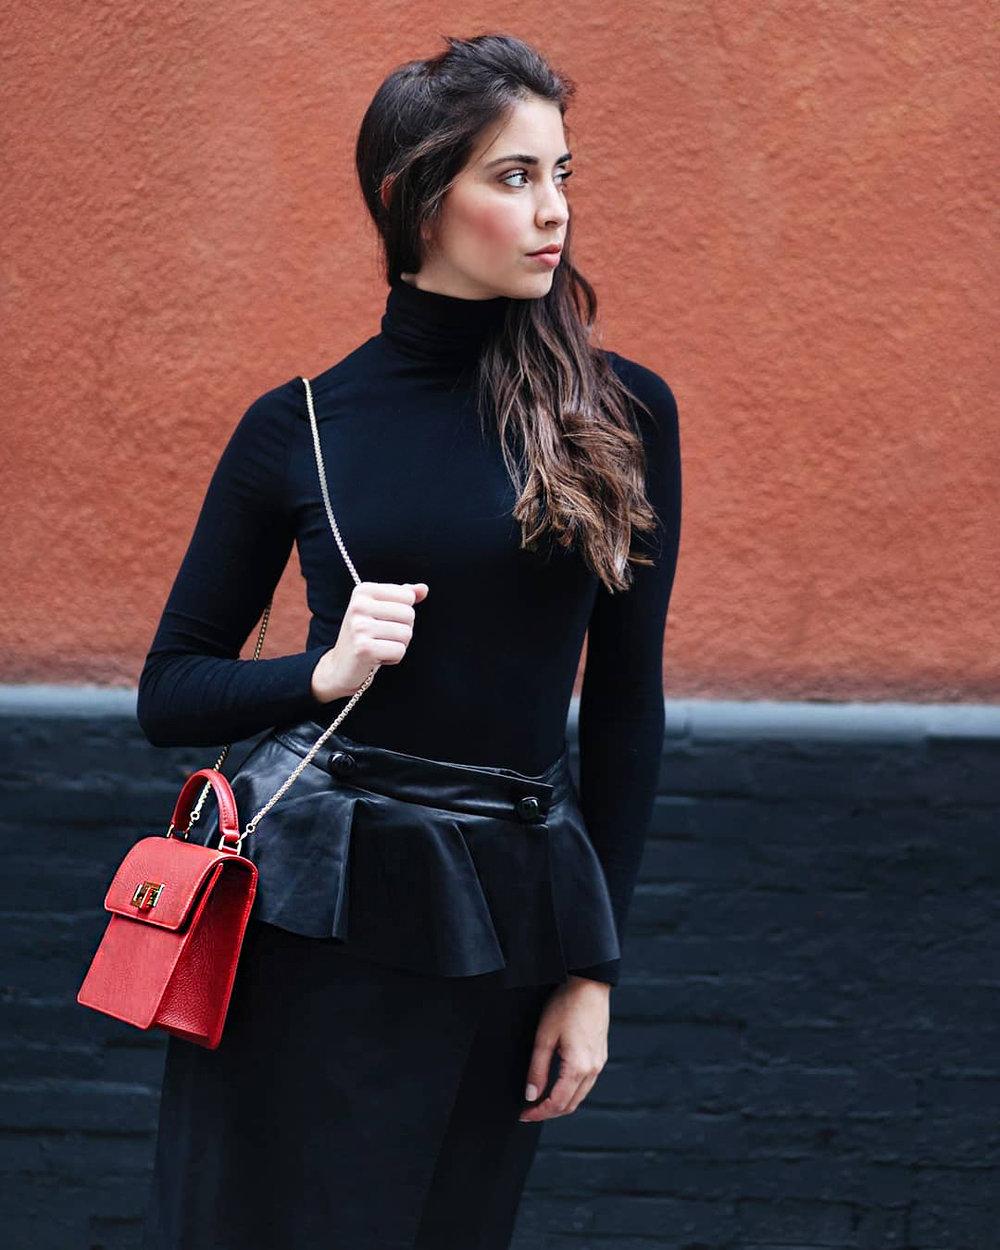 babettephotography_seville fashion sevilla moda editorial1.jpg